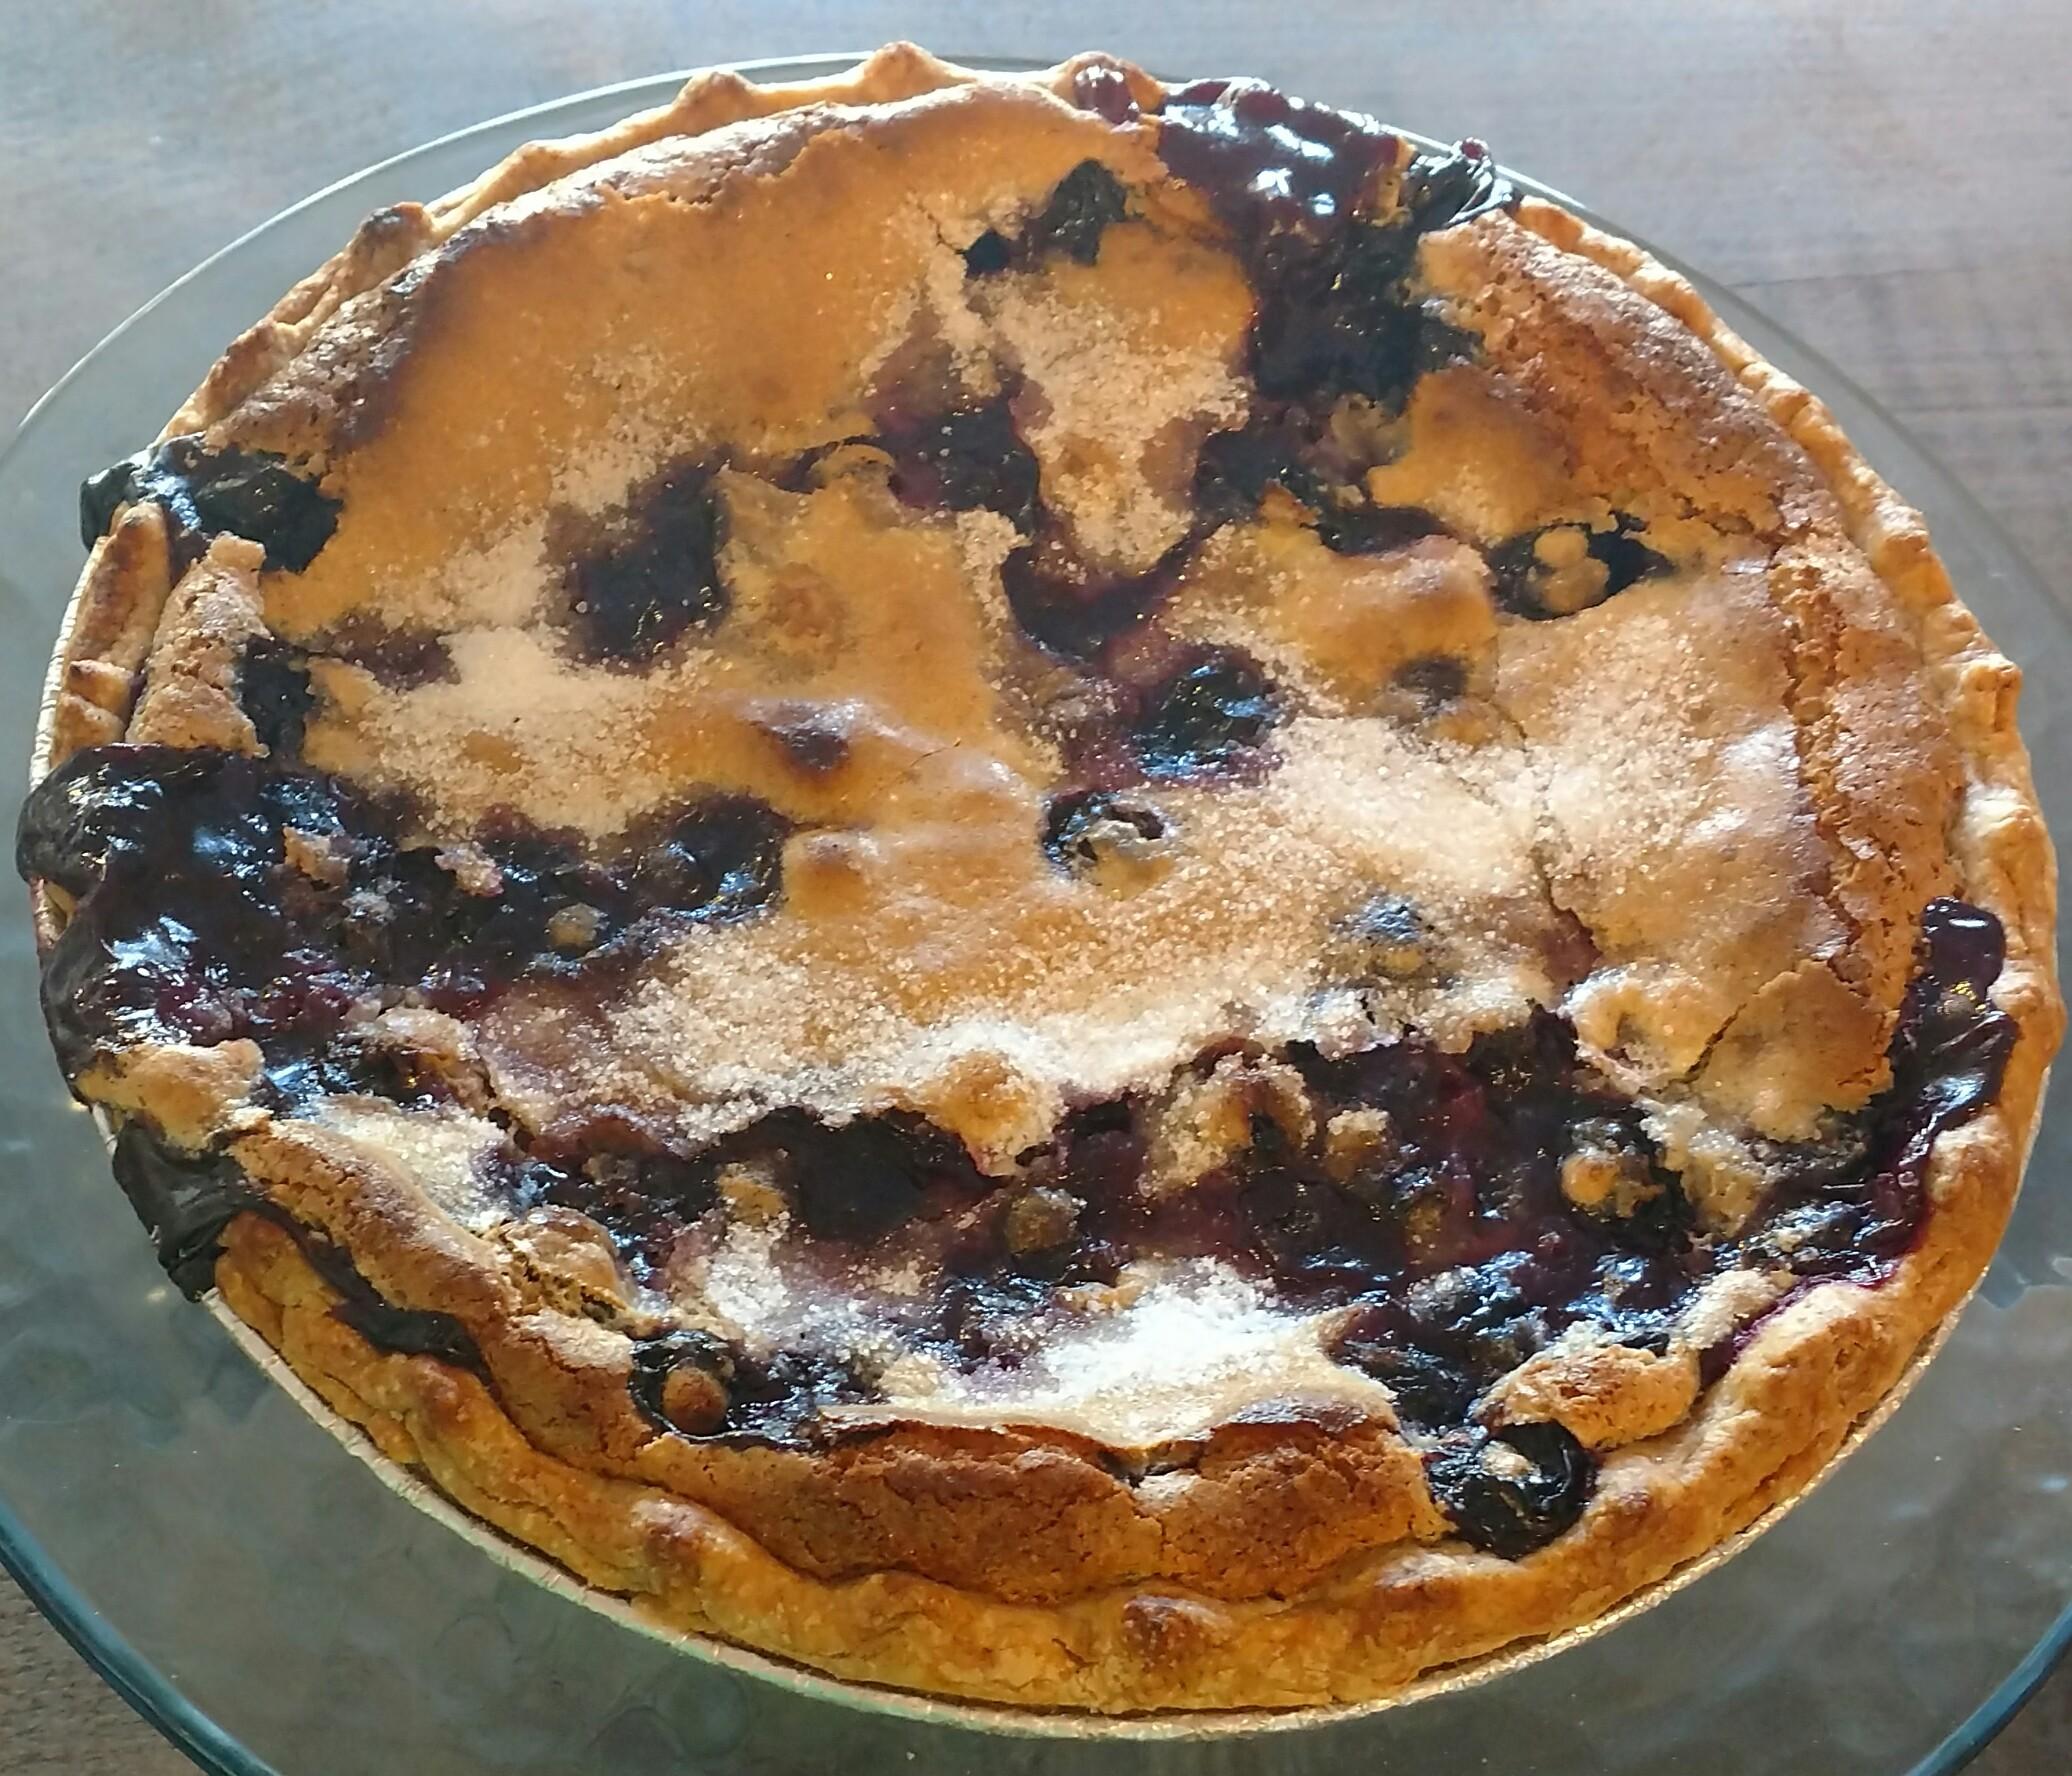 Sour Cream Blueberry Pie